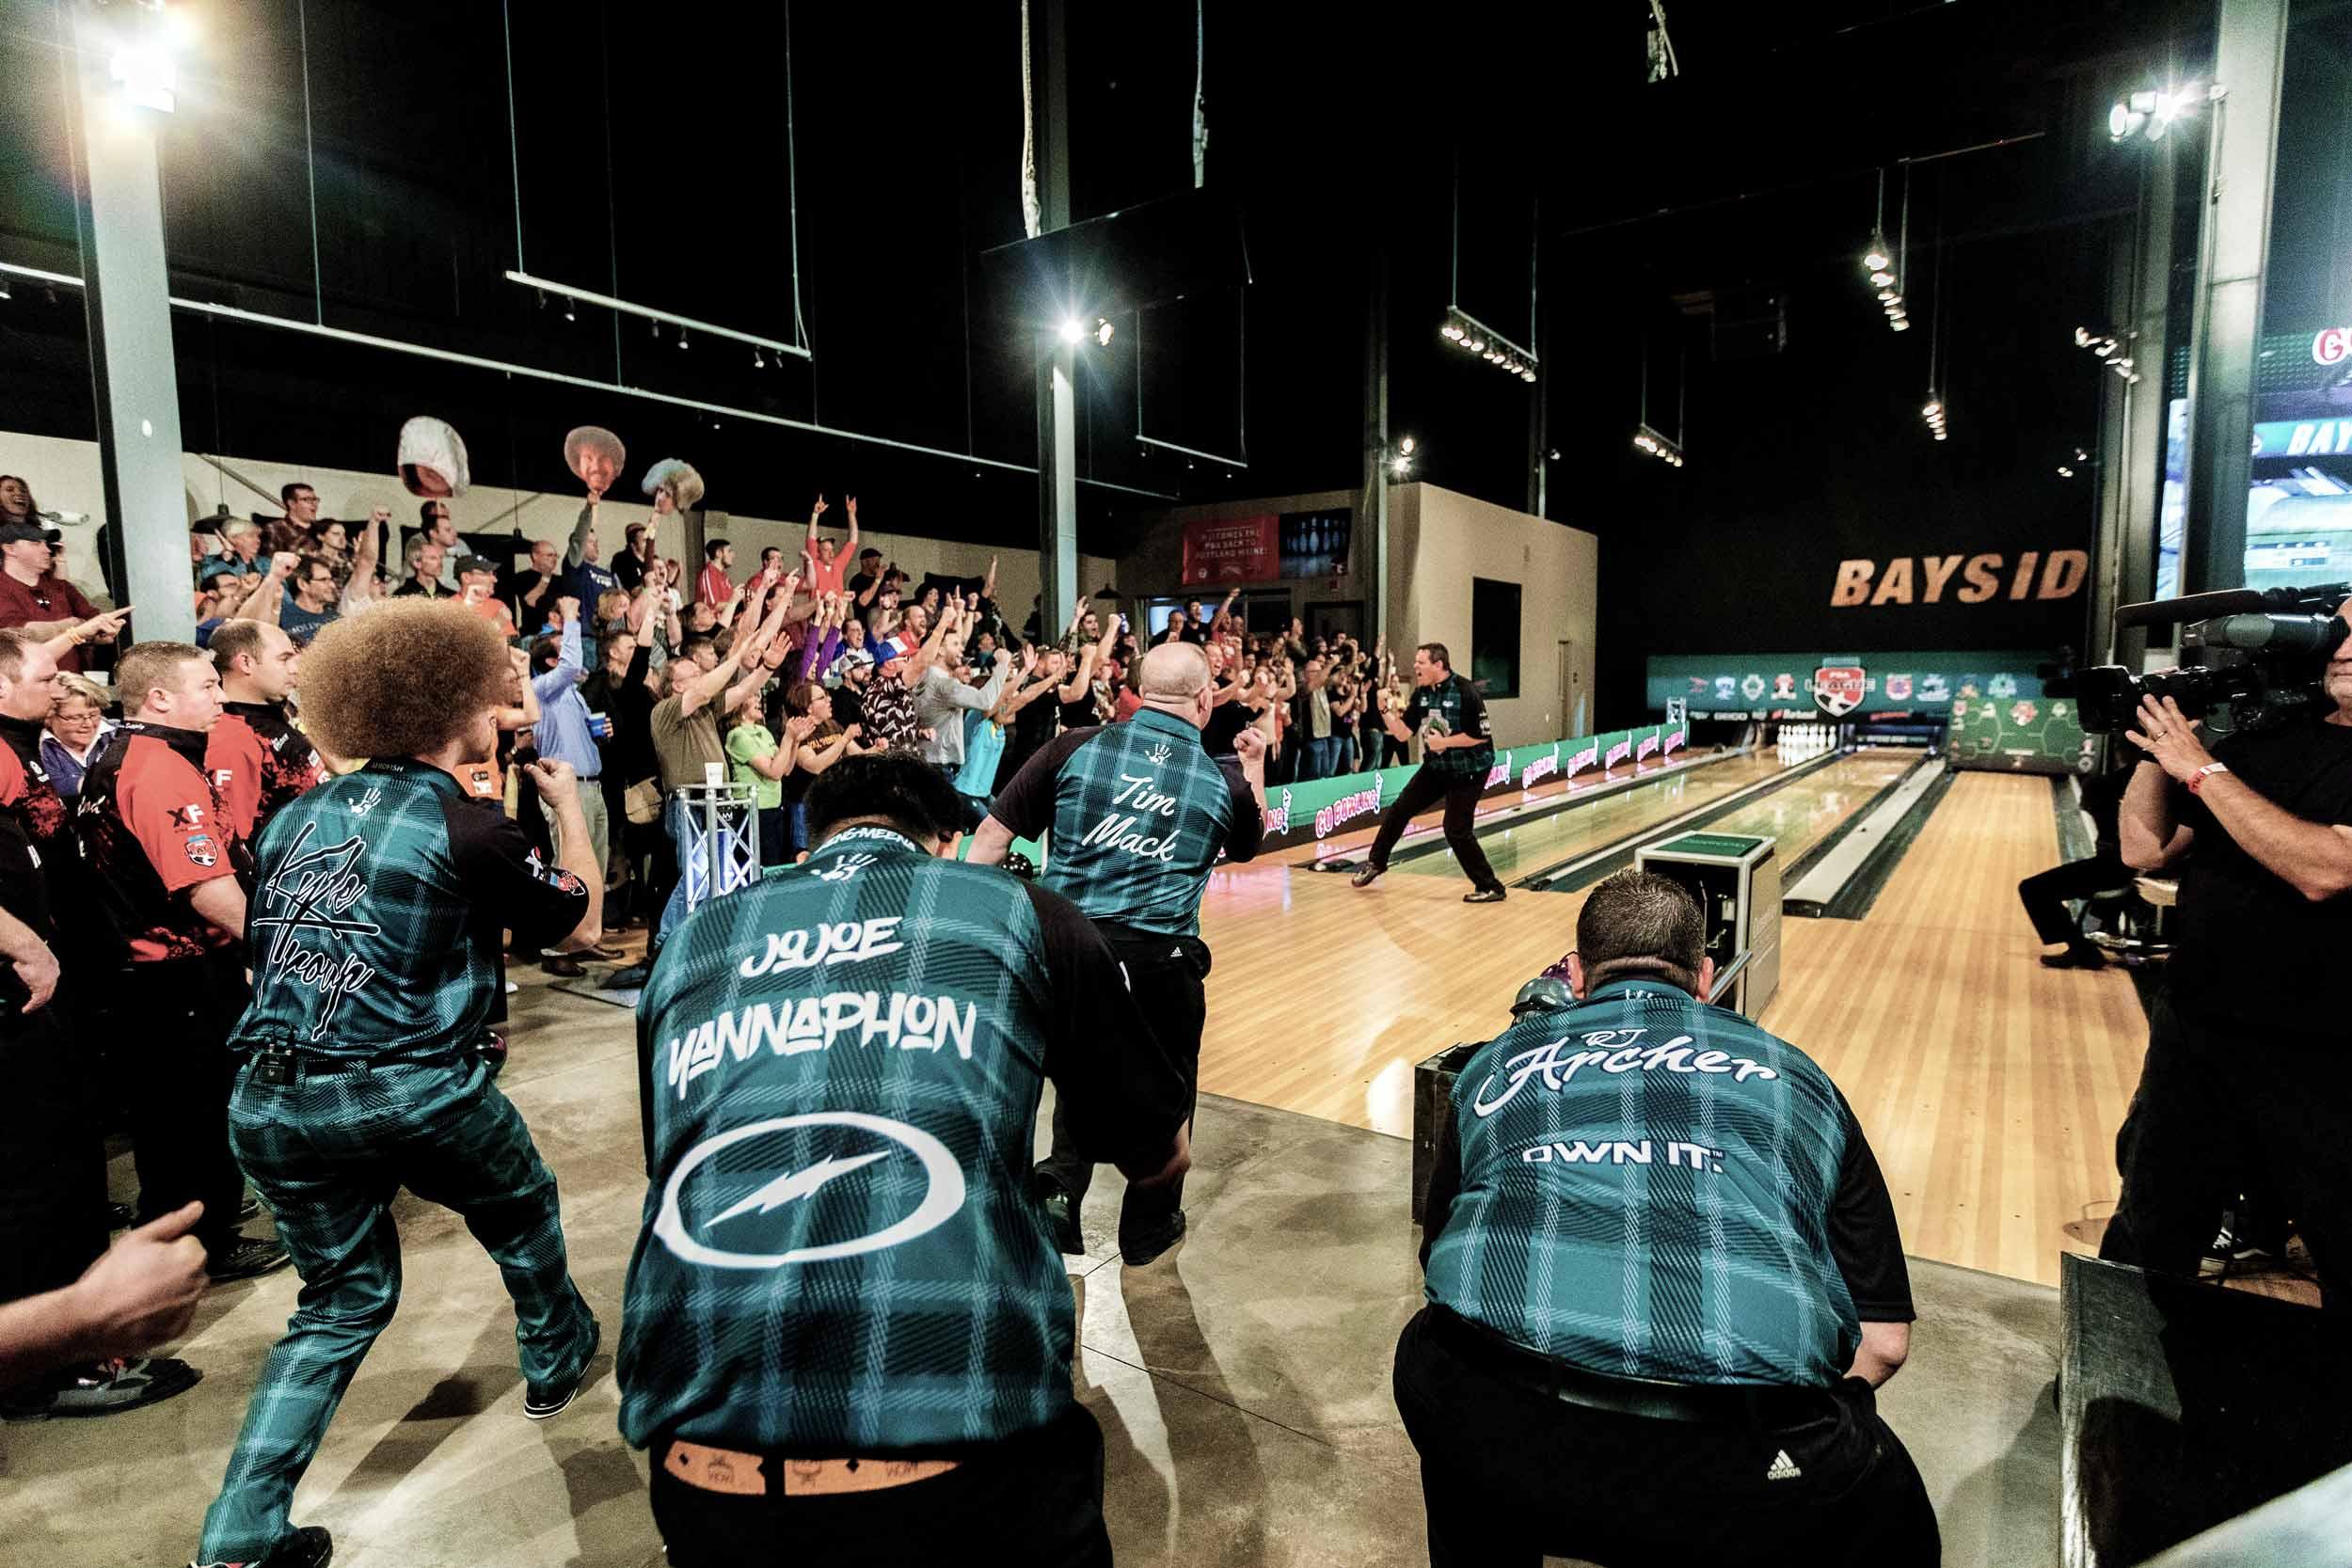 Professional team, The Lumberjacks, cheering on teammate Wes Mallott at Bayside Bowl